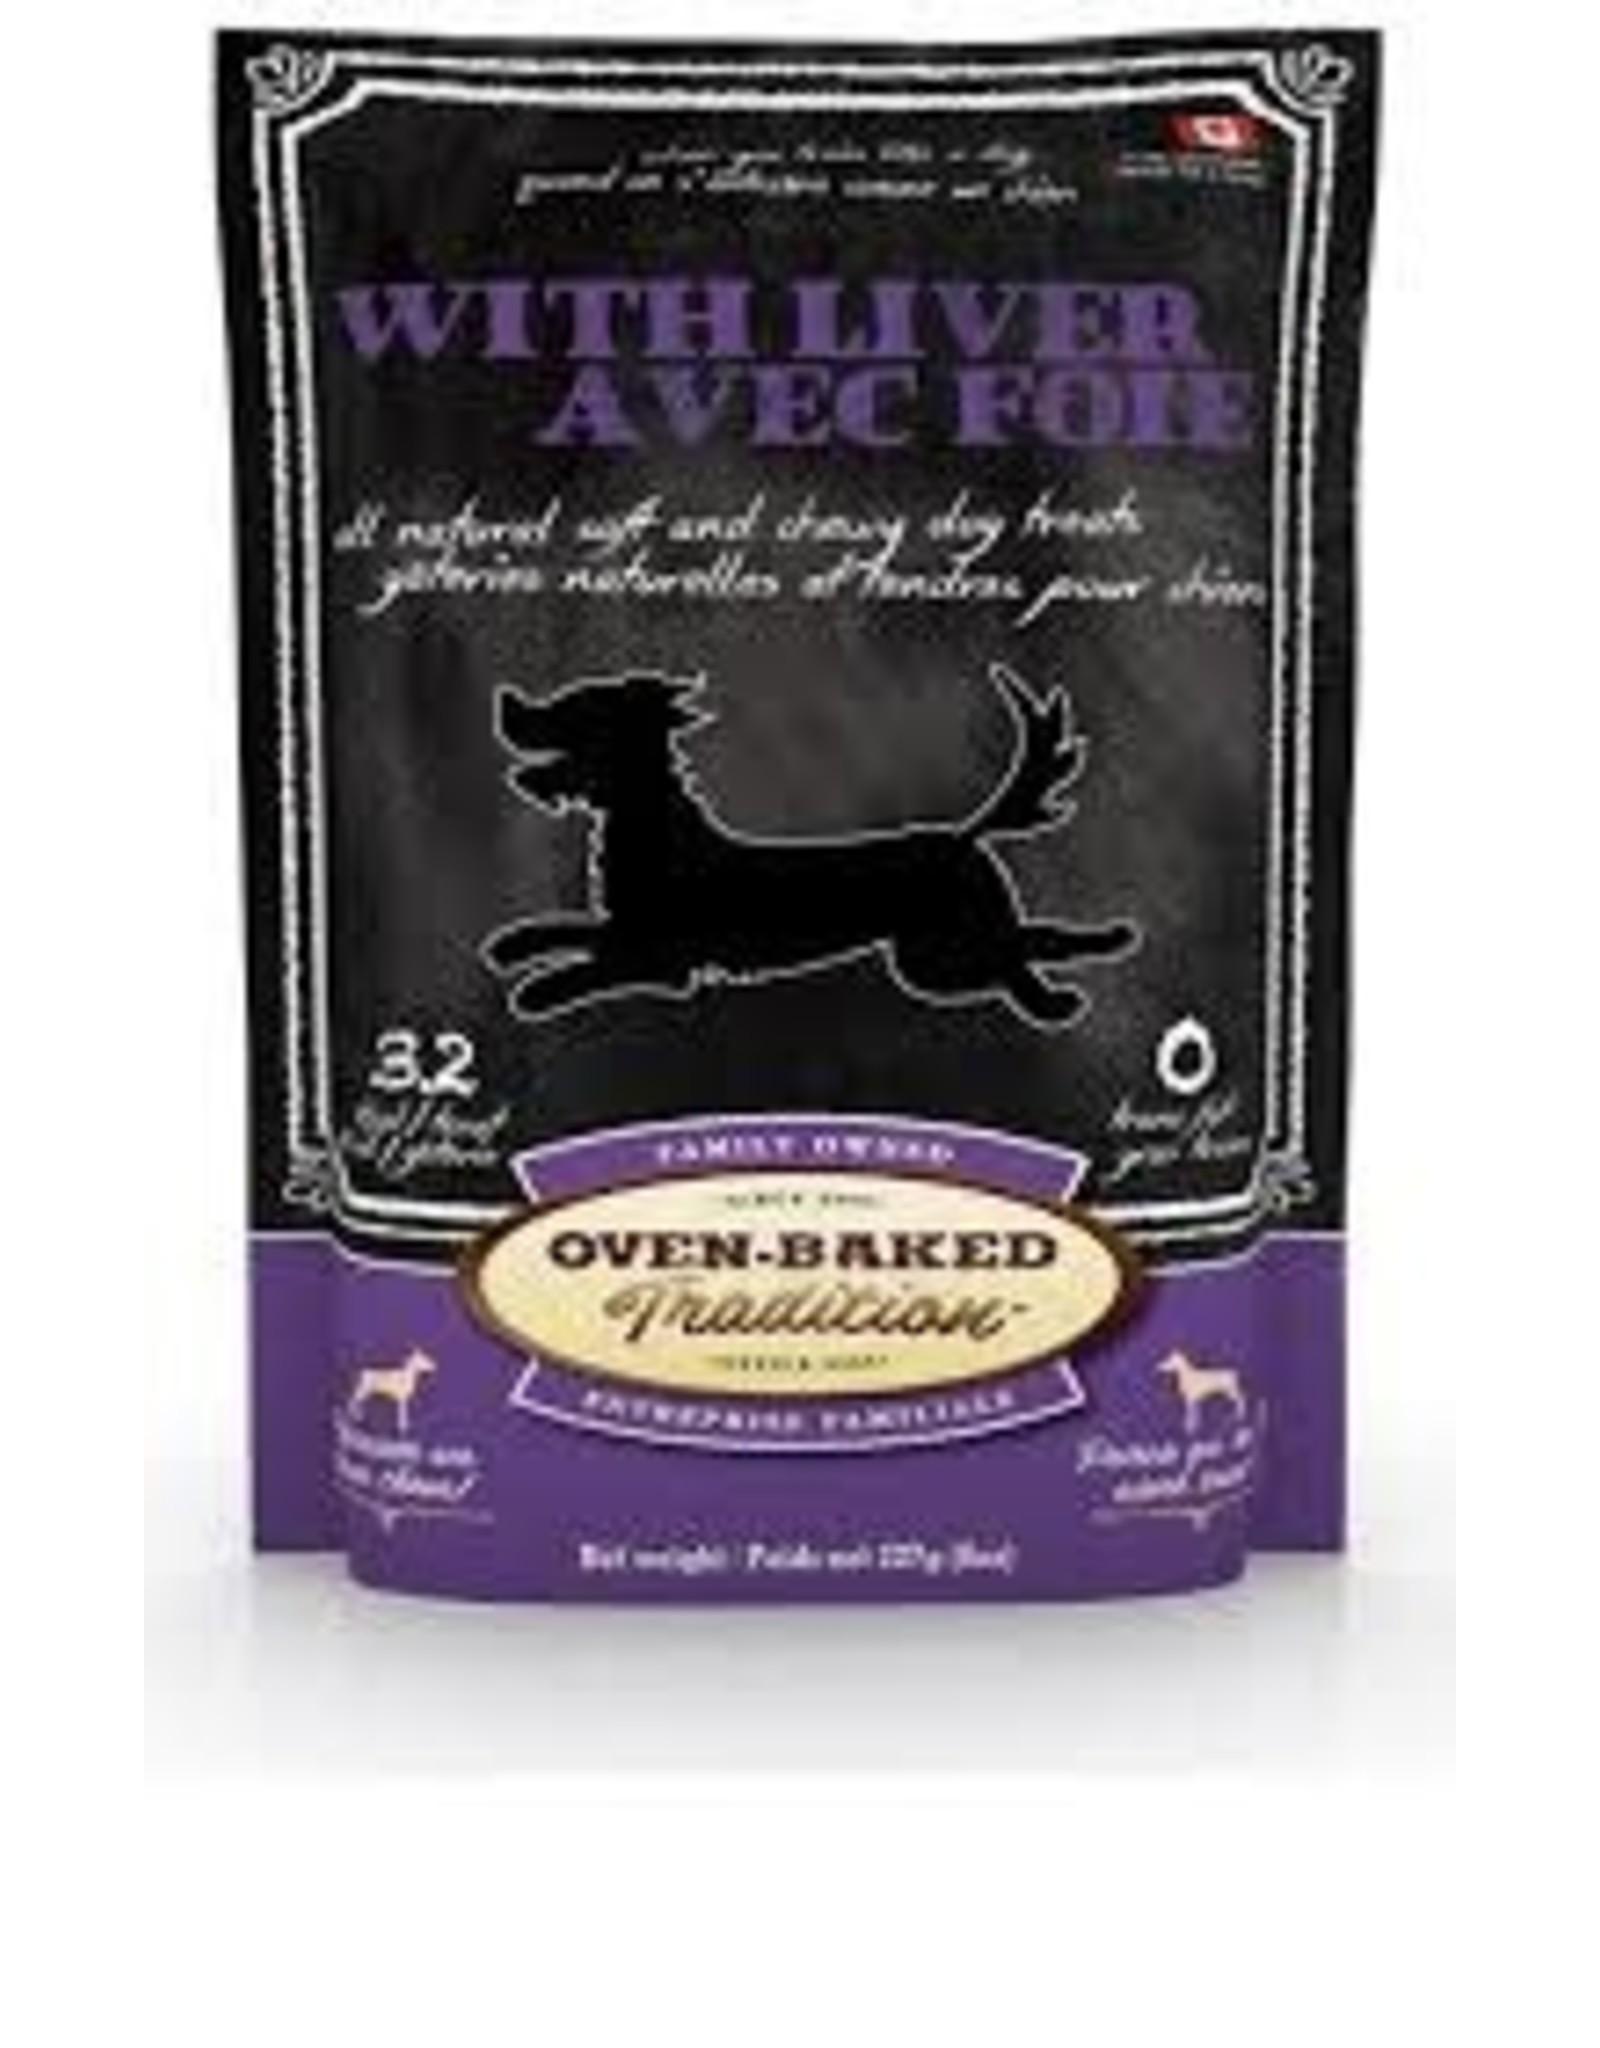 Oven-Baked Tradition Oven-Baked Tradition - Liver Treats 8oz